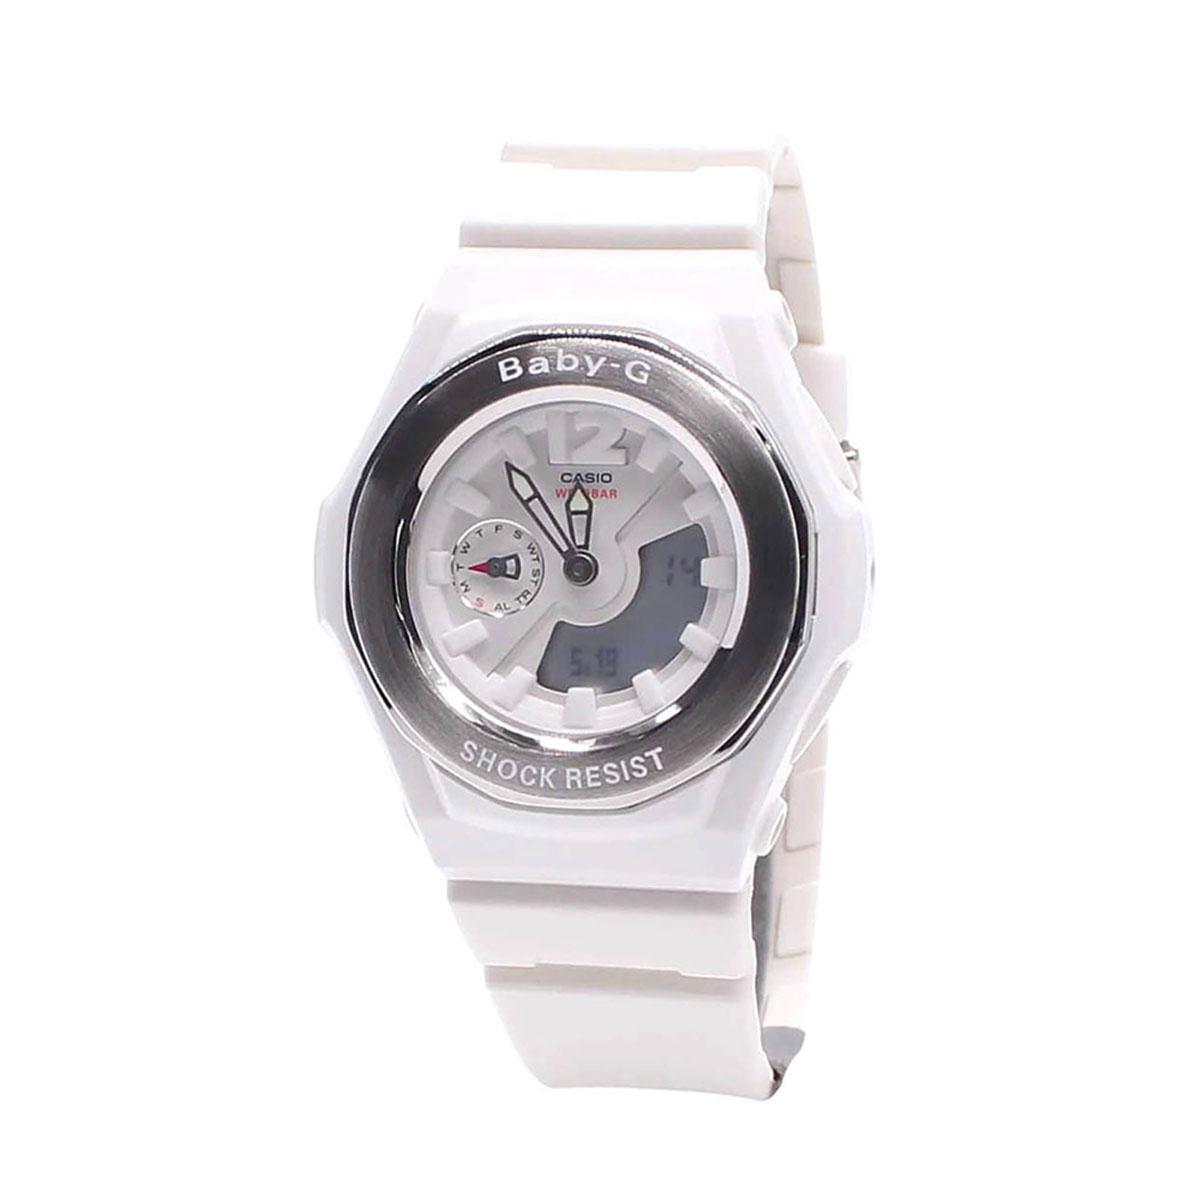 Price Update Of Casio Baby G Bga 195 7a White Singapore Barabai 150ef 7b Watch Resin Case Strap Ladies 140